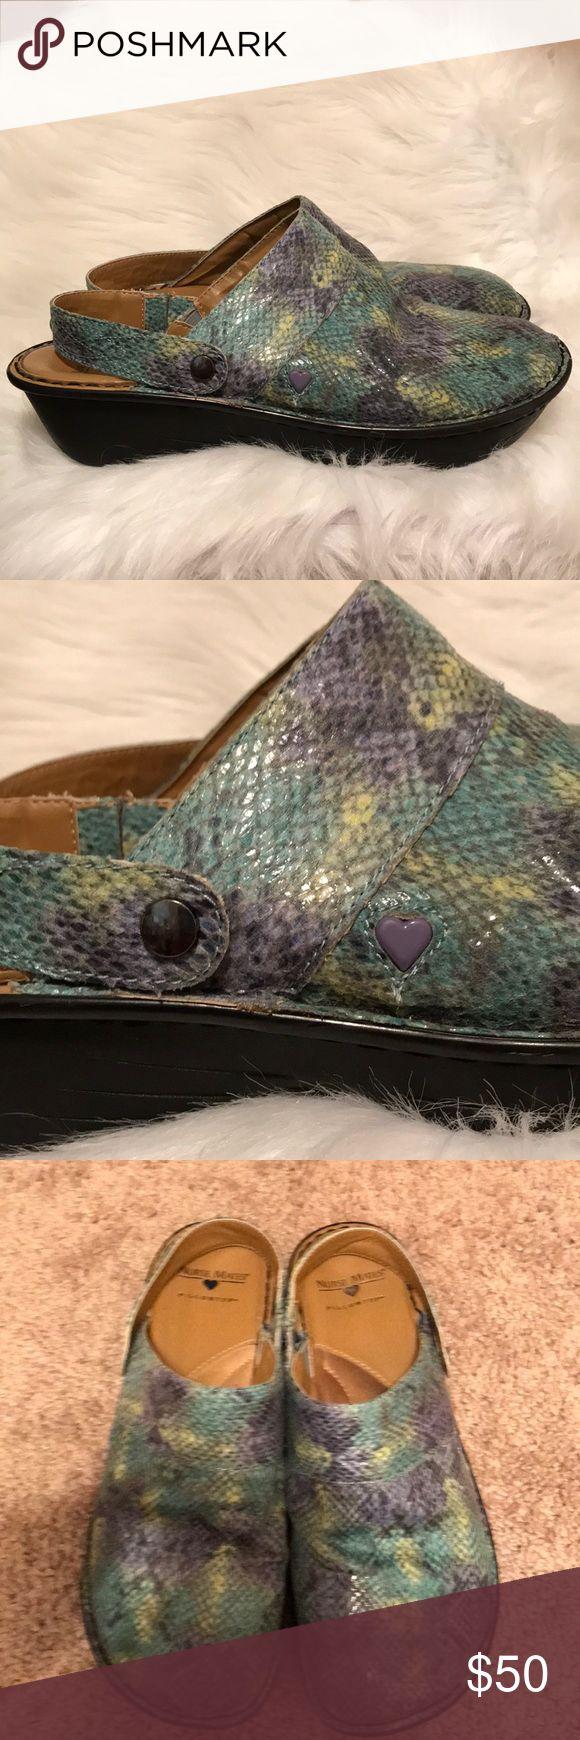 Nurse Mates Pillow Top work shoes😍❤️ In EUC size 10 medium made for comfort 😍❤️ Nurse Mates Shoes